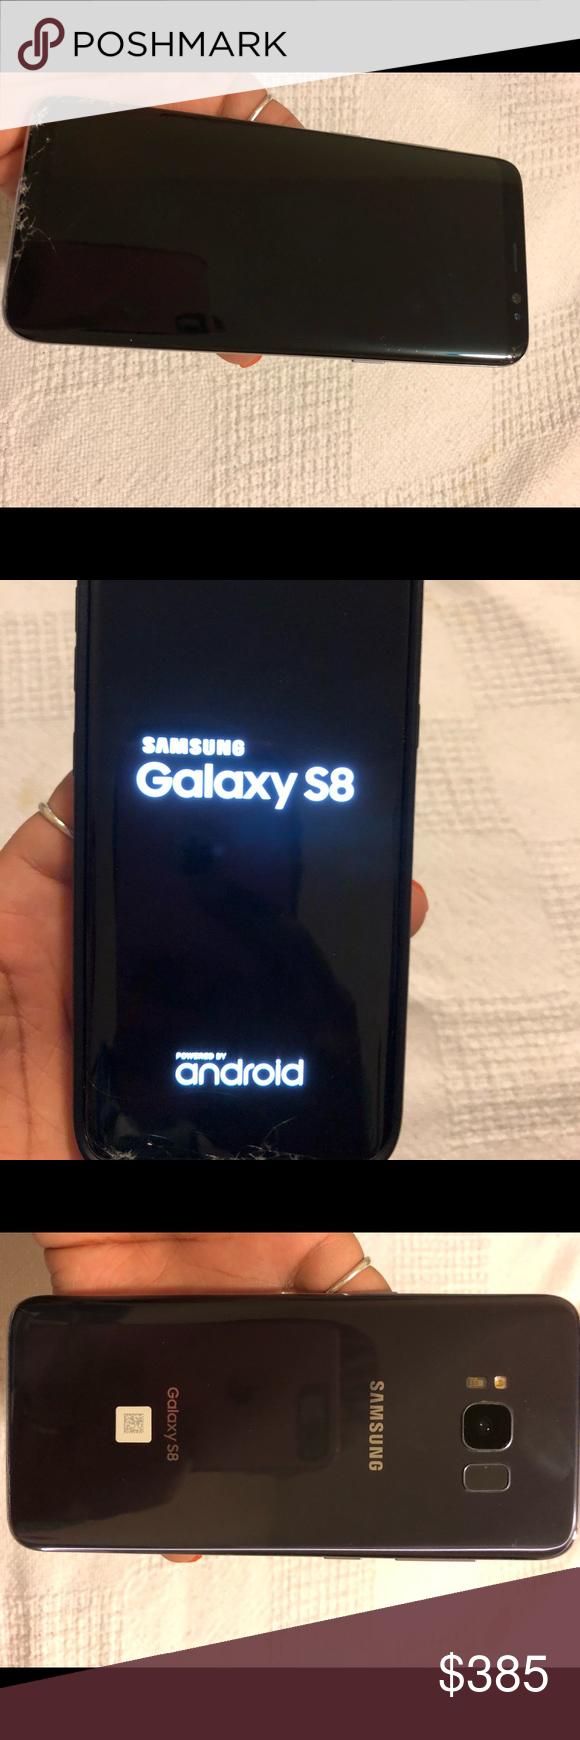 Verizon Wireless Galaxy s8 Verizon wireless, Galaxy s8